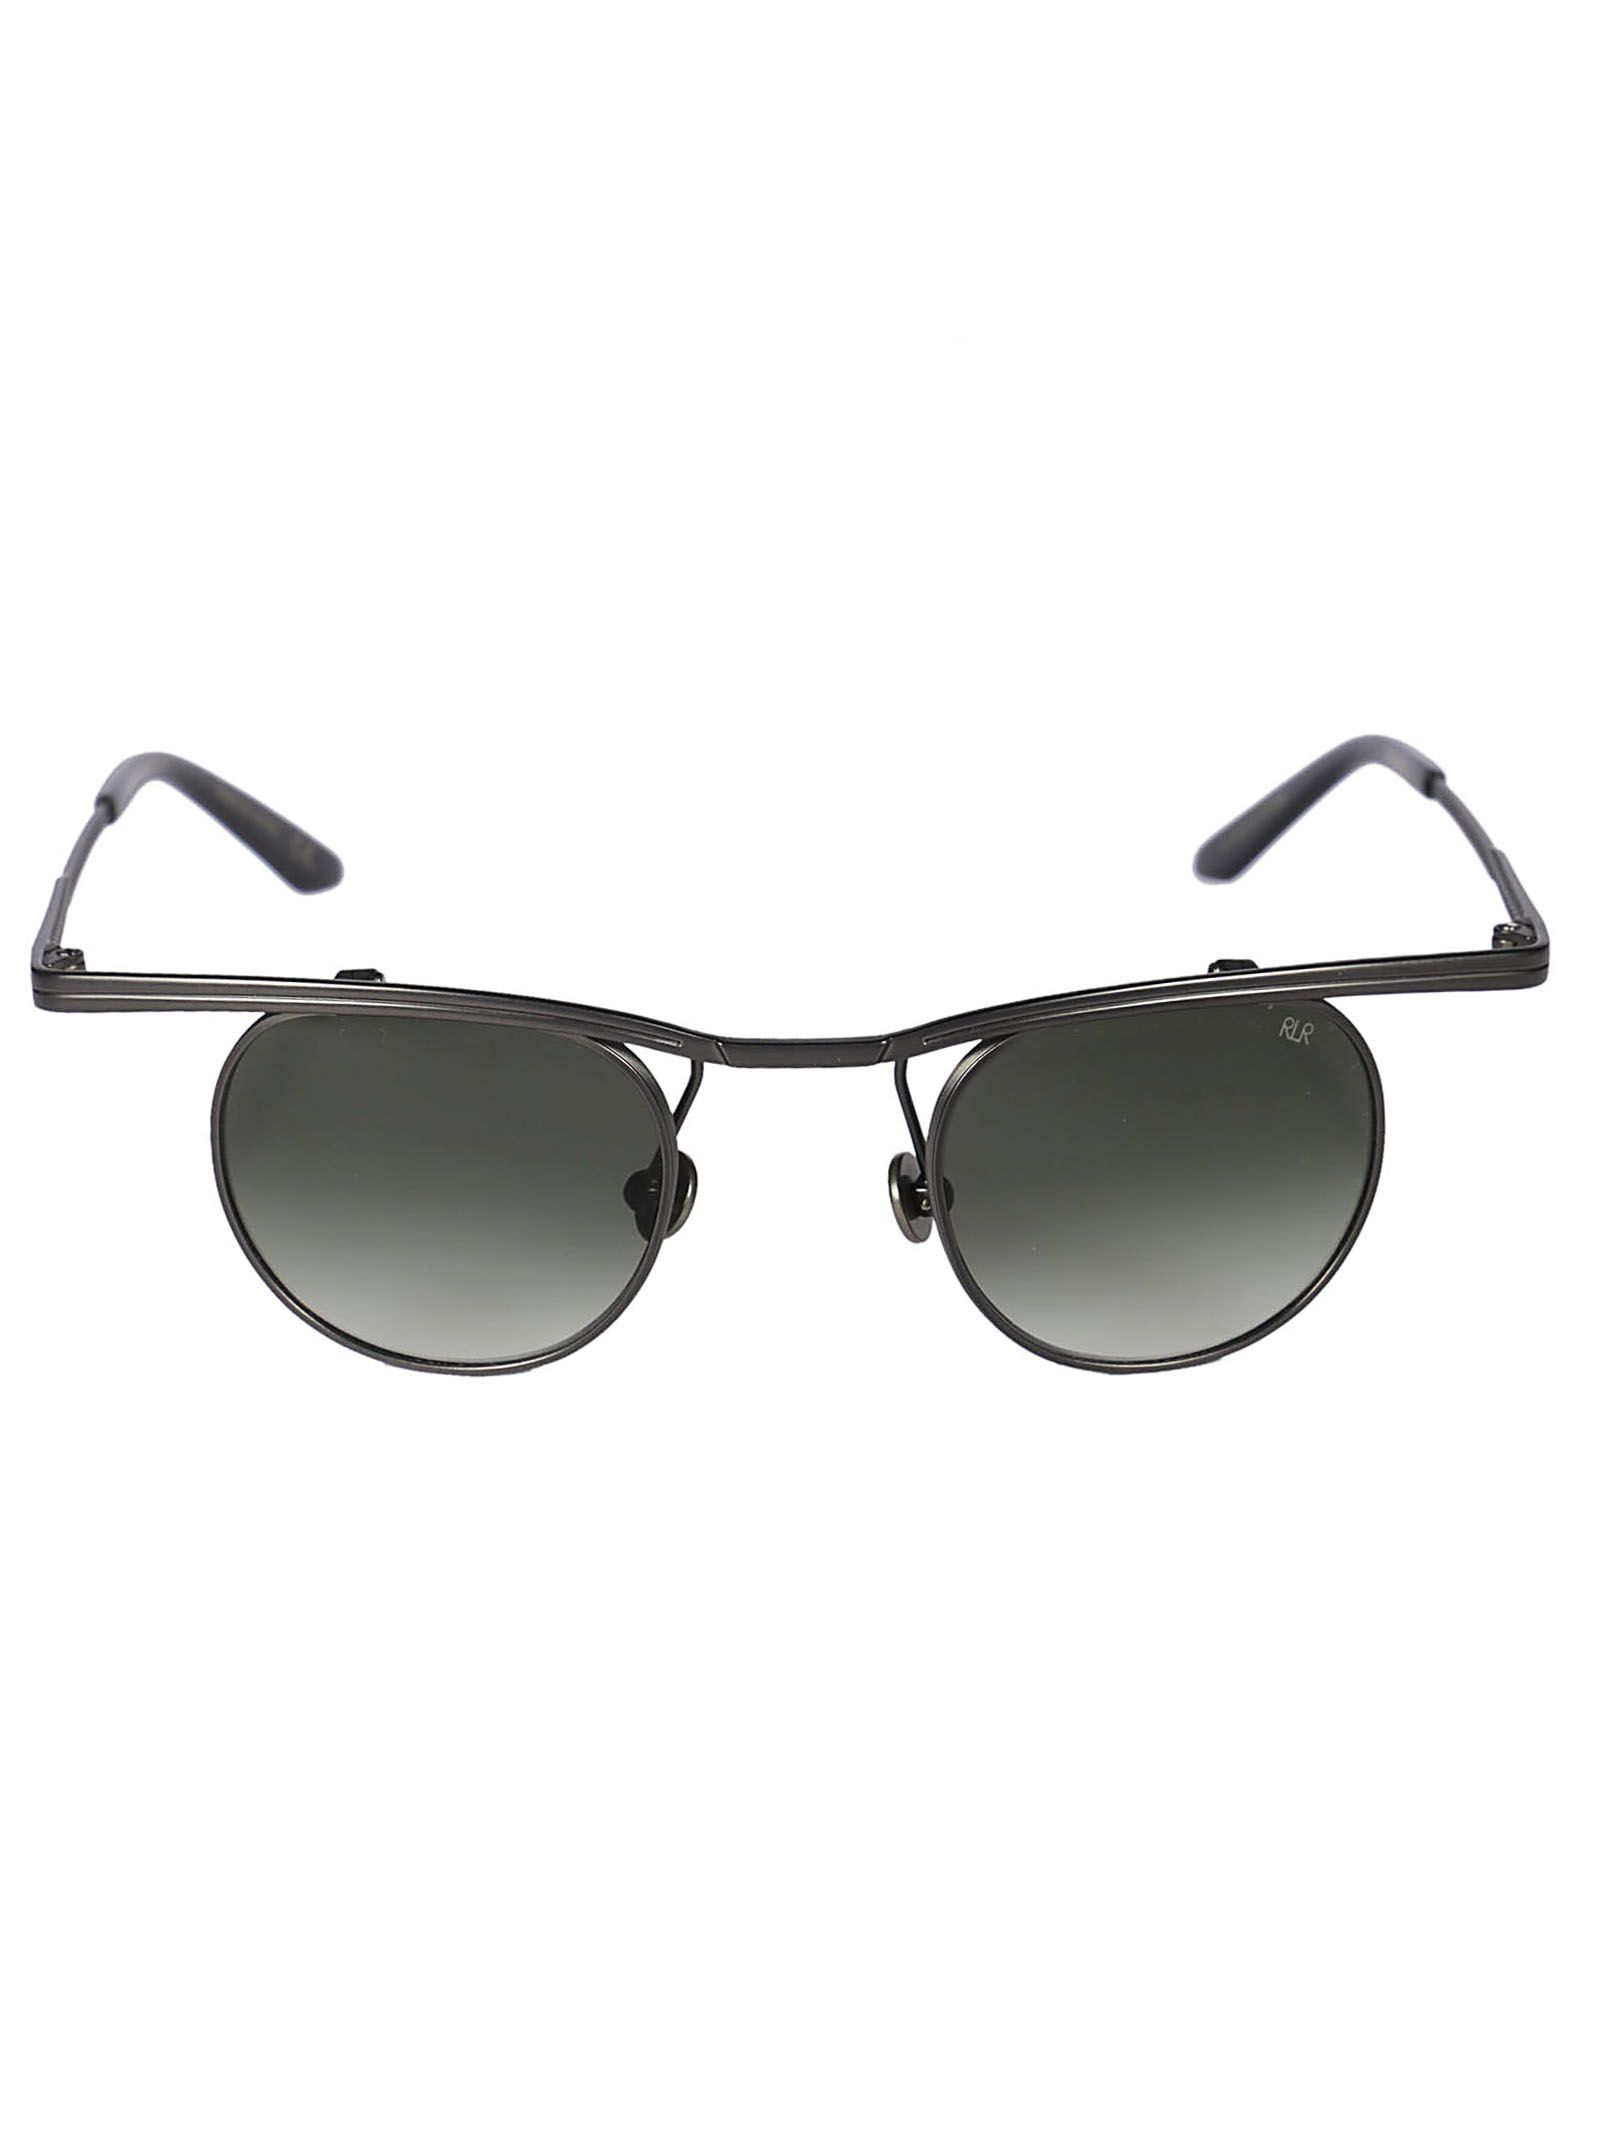 ROBERT LA ROCHE Robert Laroche Winged Round Frame Sunglasses in Gunmetal